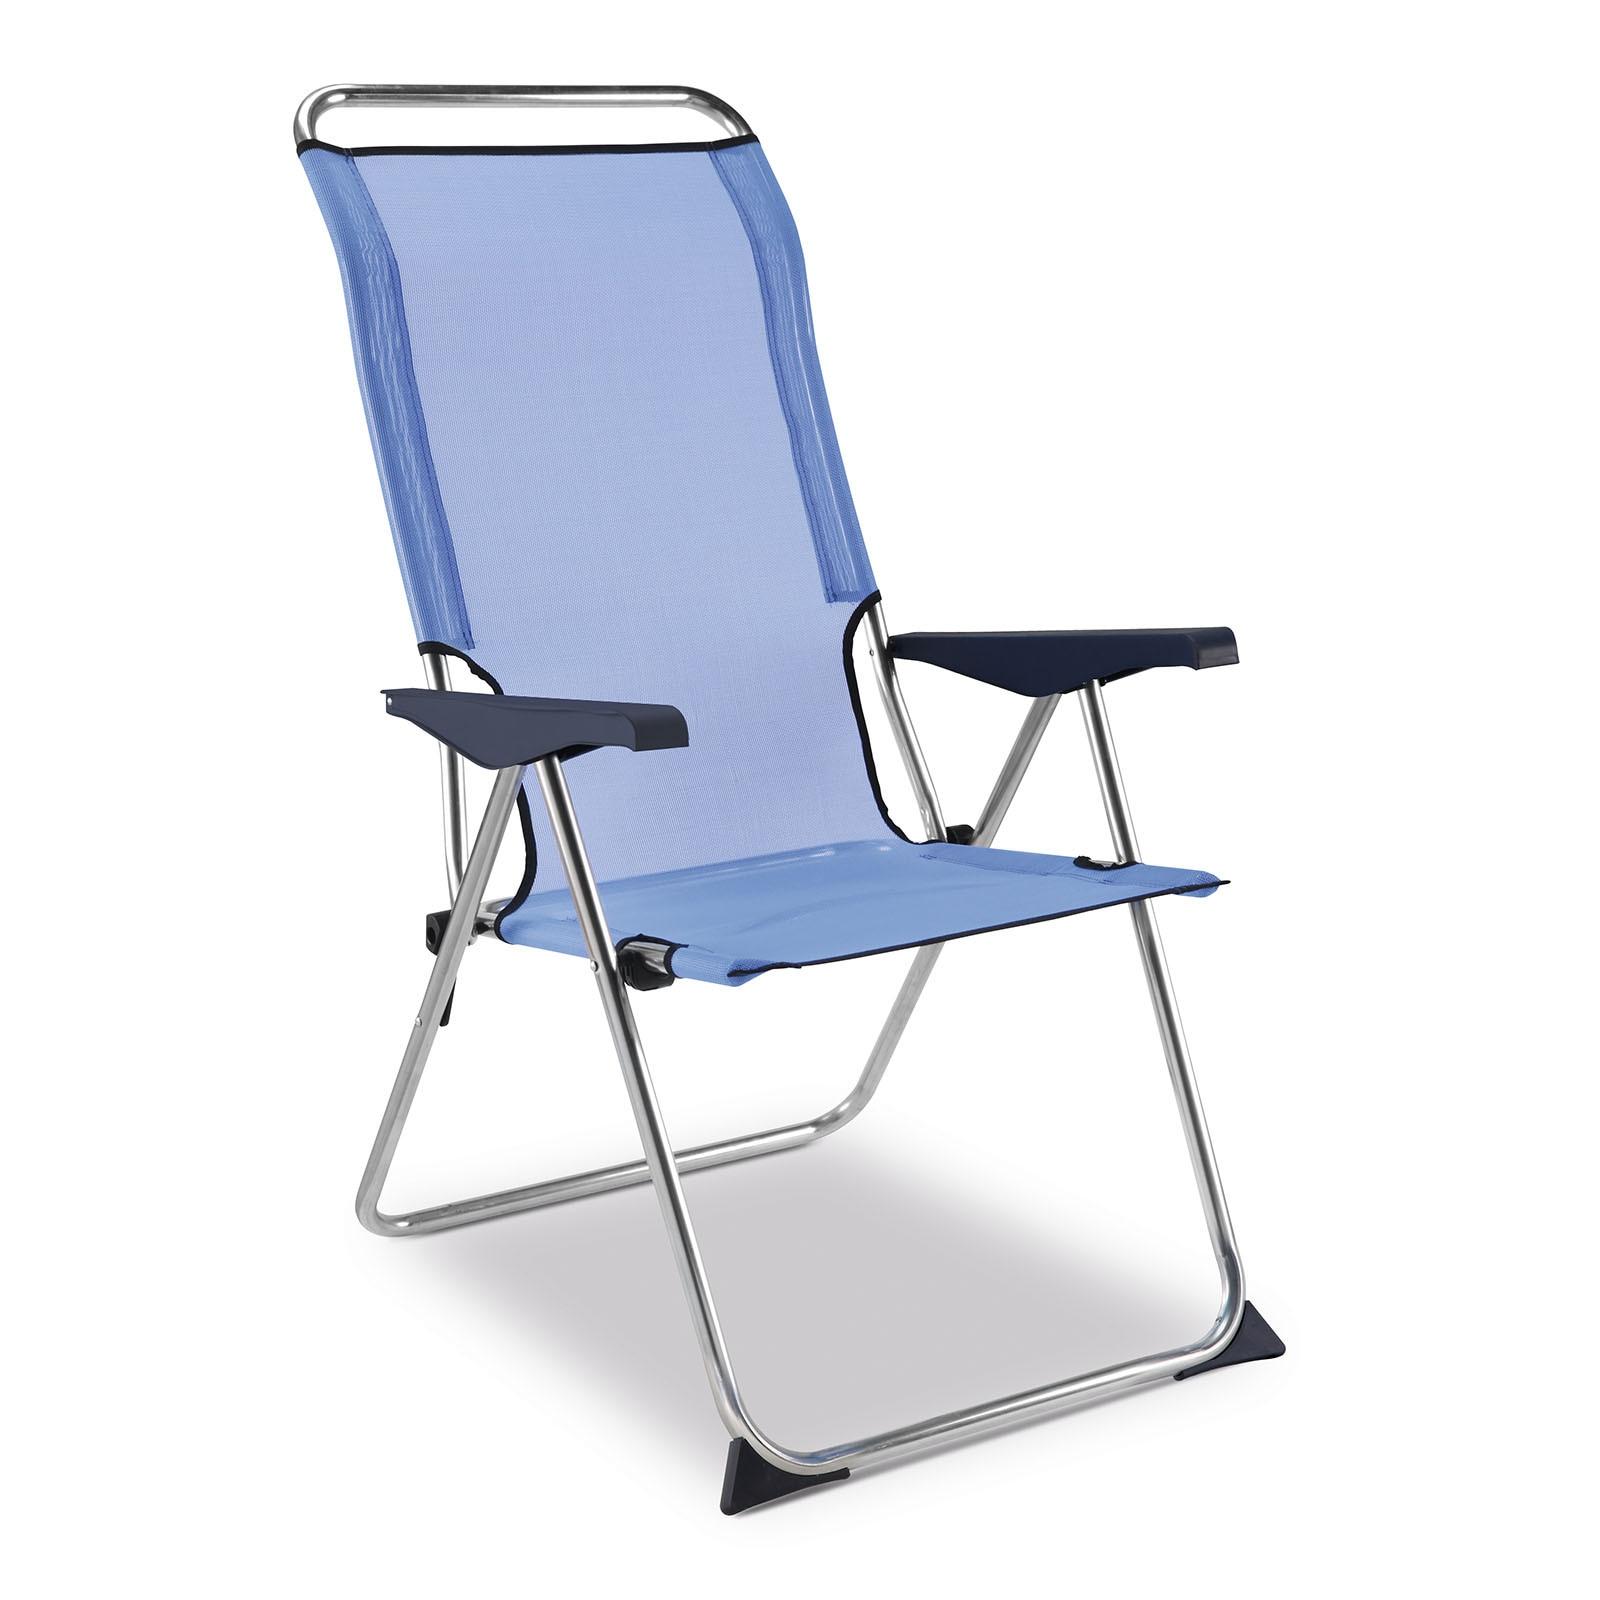 Solenny Armchair 5 Position Backrest Anatomical Blue-50001072725199-